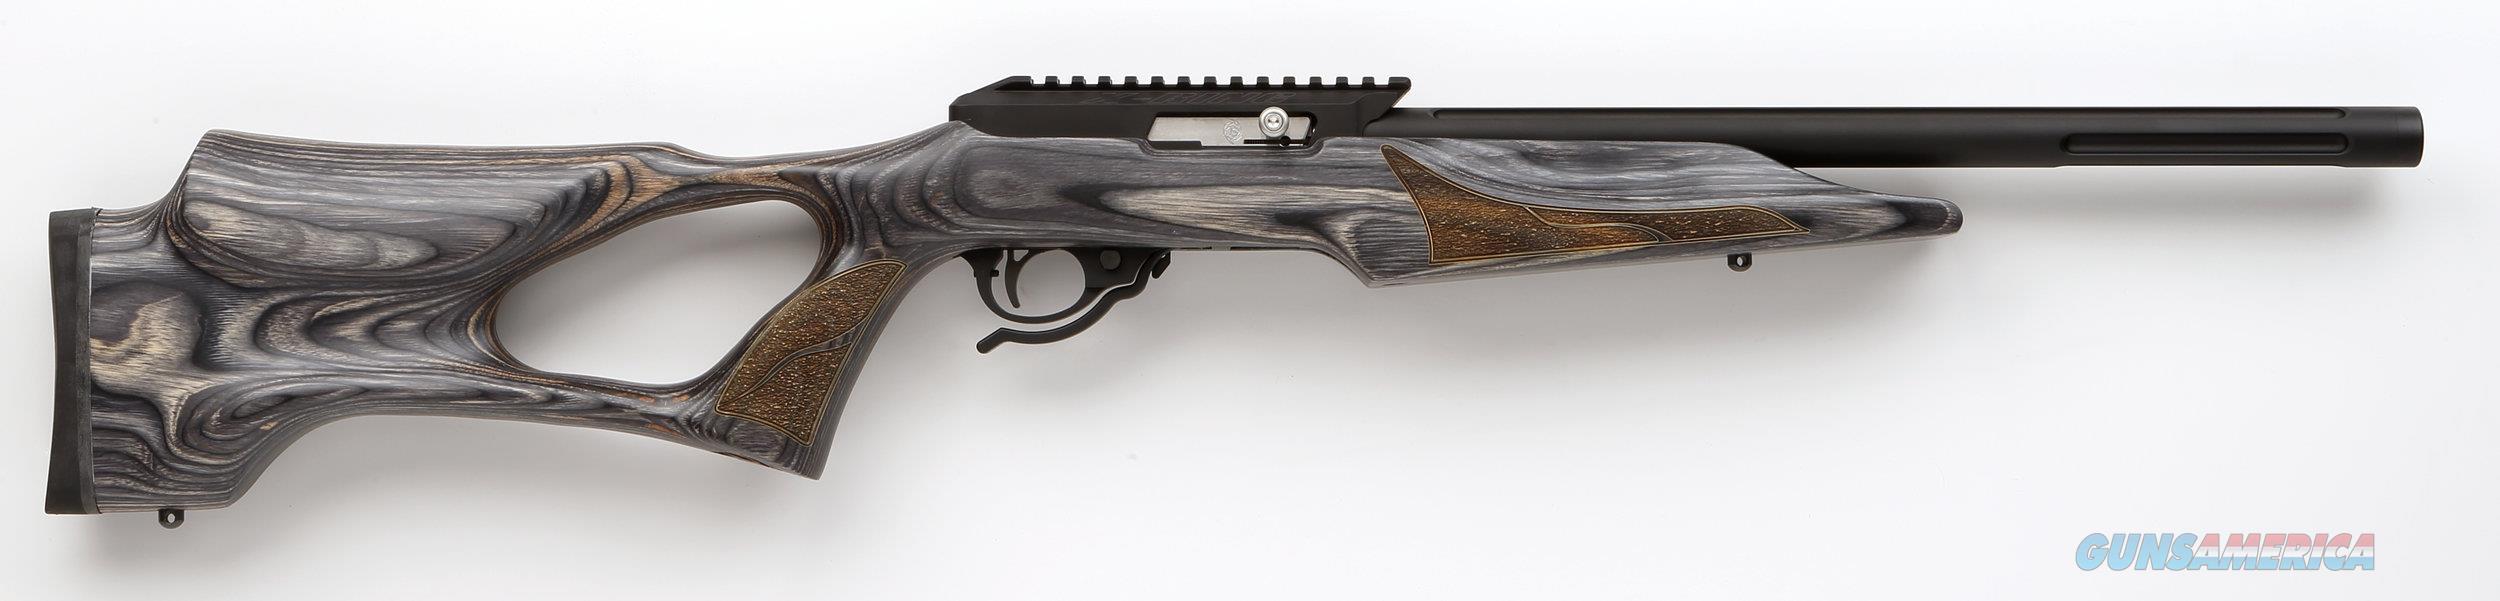 "Tactical Solutions X-Ring Vantage RS .22 LR 16.5"" ATE-MB-B-V-SLT  Guns > Rifles > Ruger Rifles > 10-22"